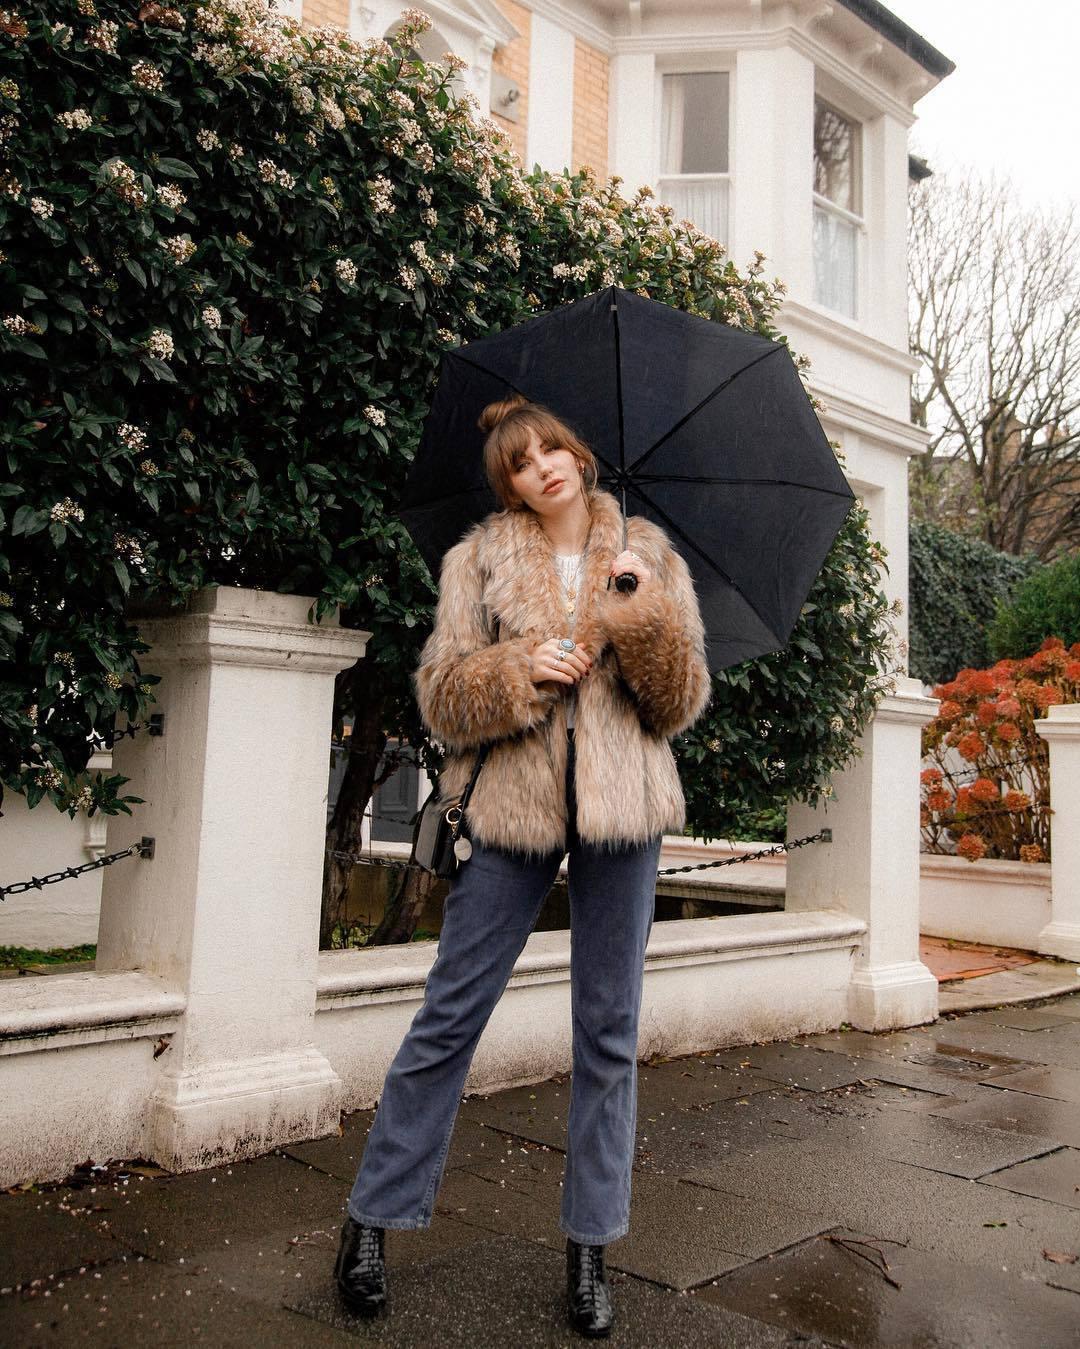 jeans straight jeans levi's black boots patent boots black bag crossbody bag faux fur coat sweater umbrella